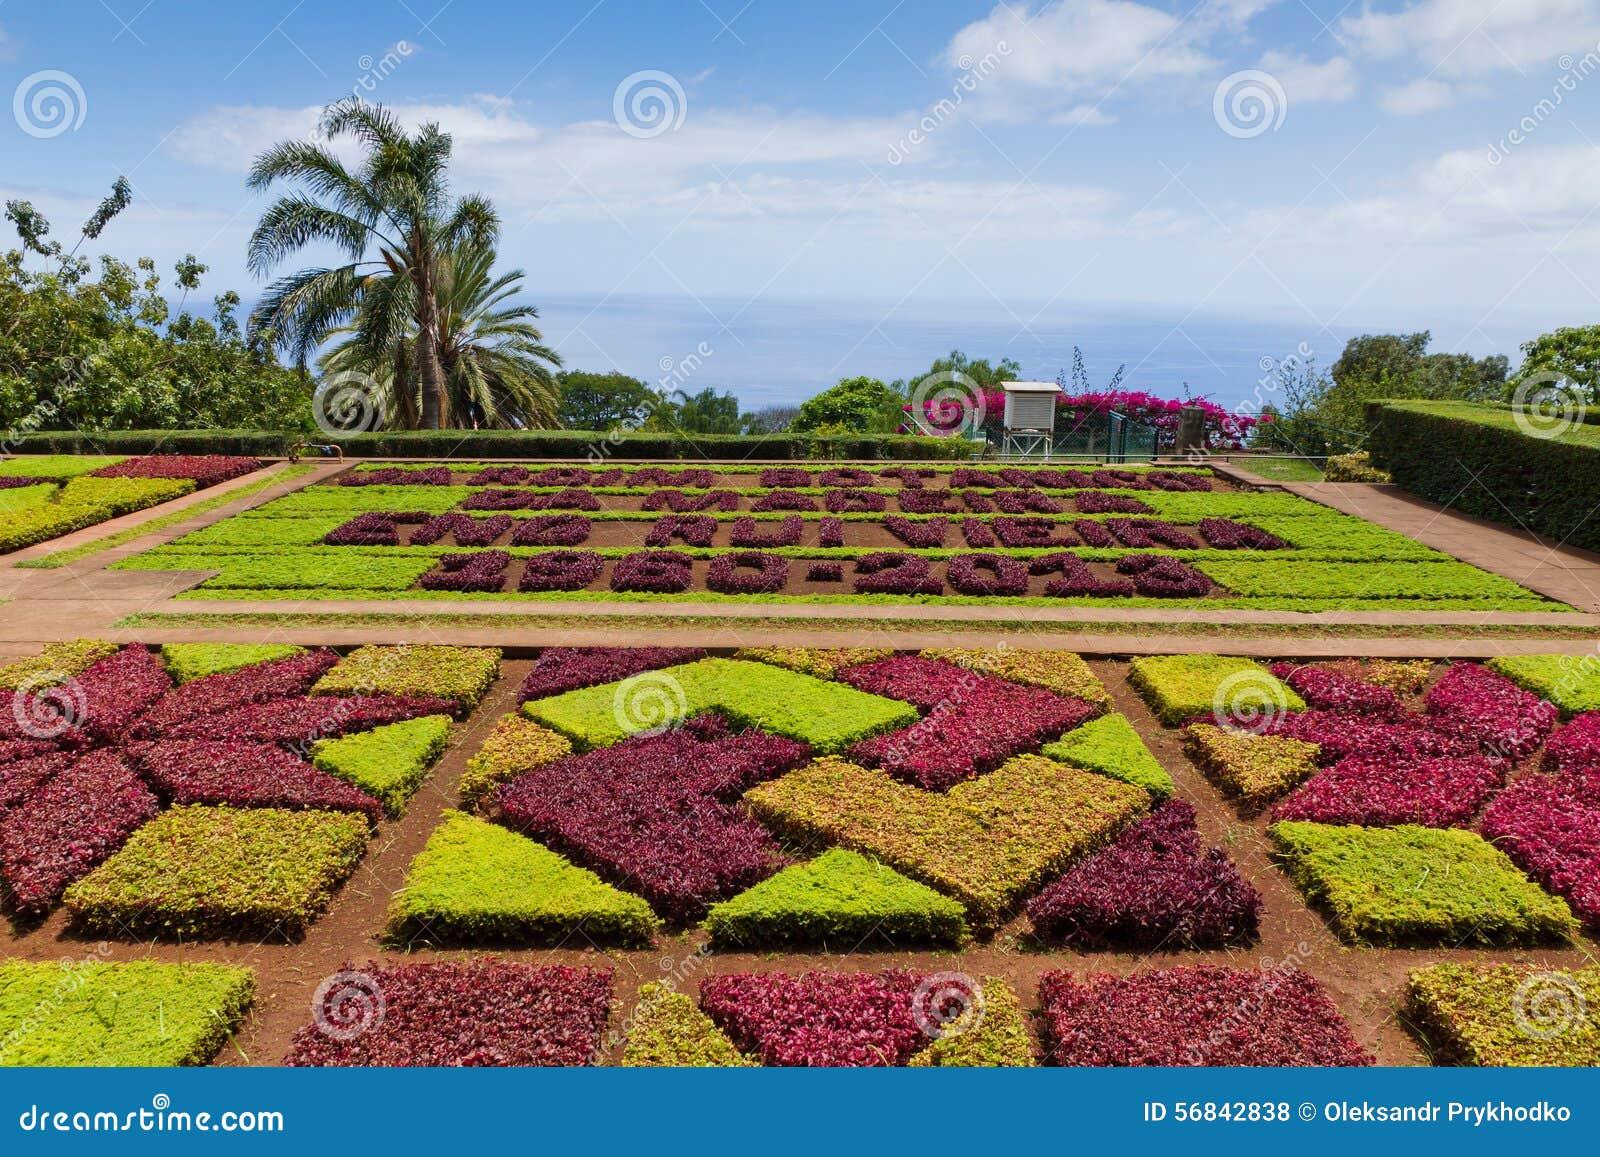 Tropical Botanical Garden In Funchal, Madeira Island, Portugal Stock ...